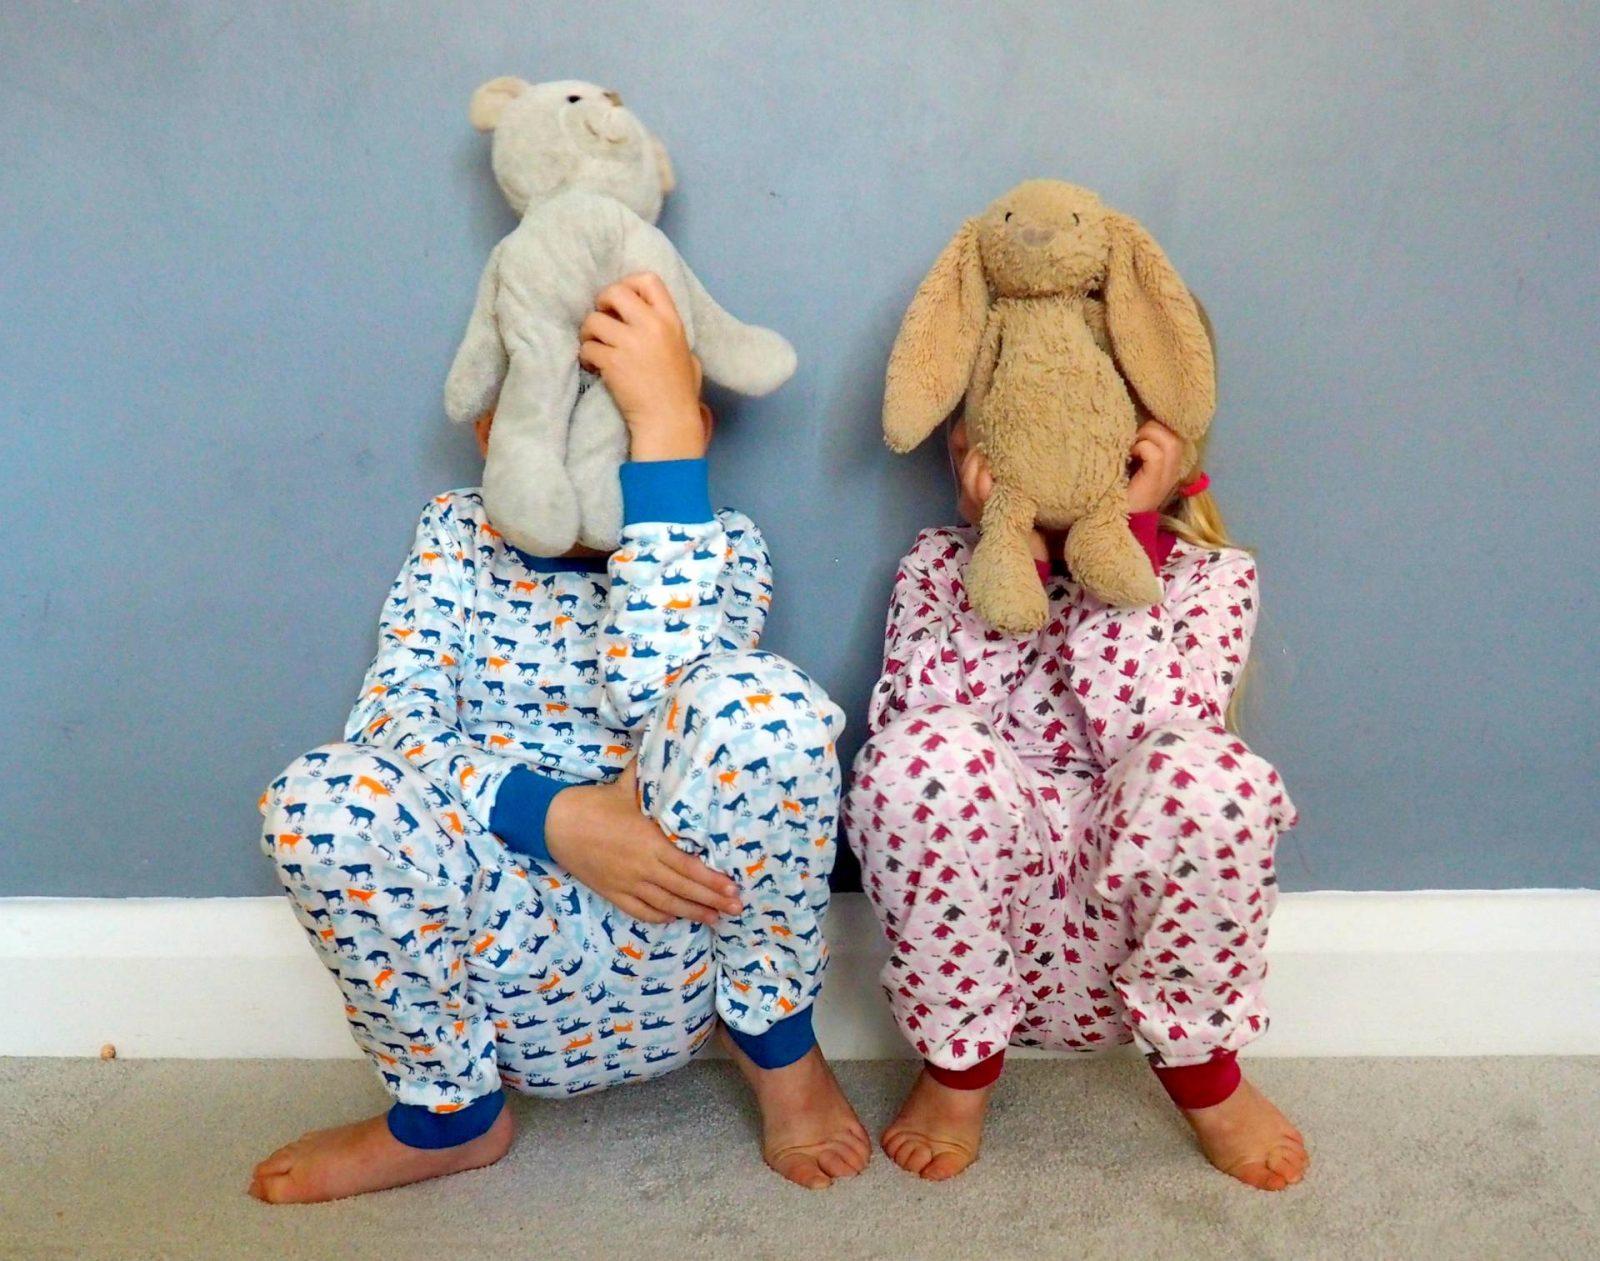 Sense Organic Children's Pyjamas and Giveaway!